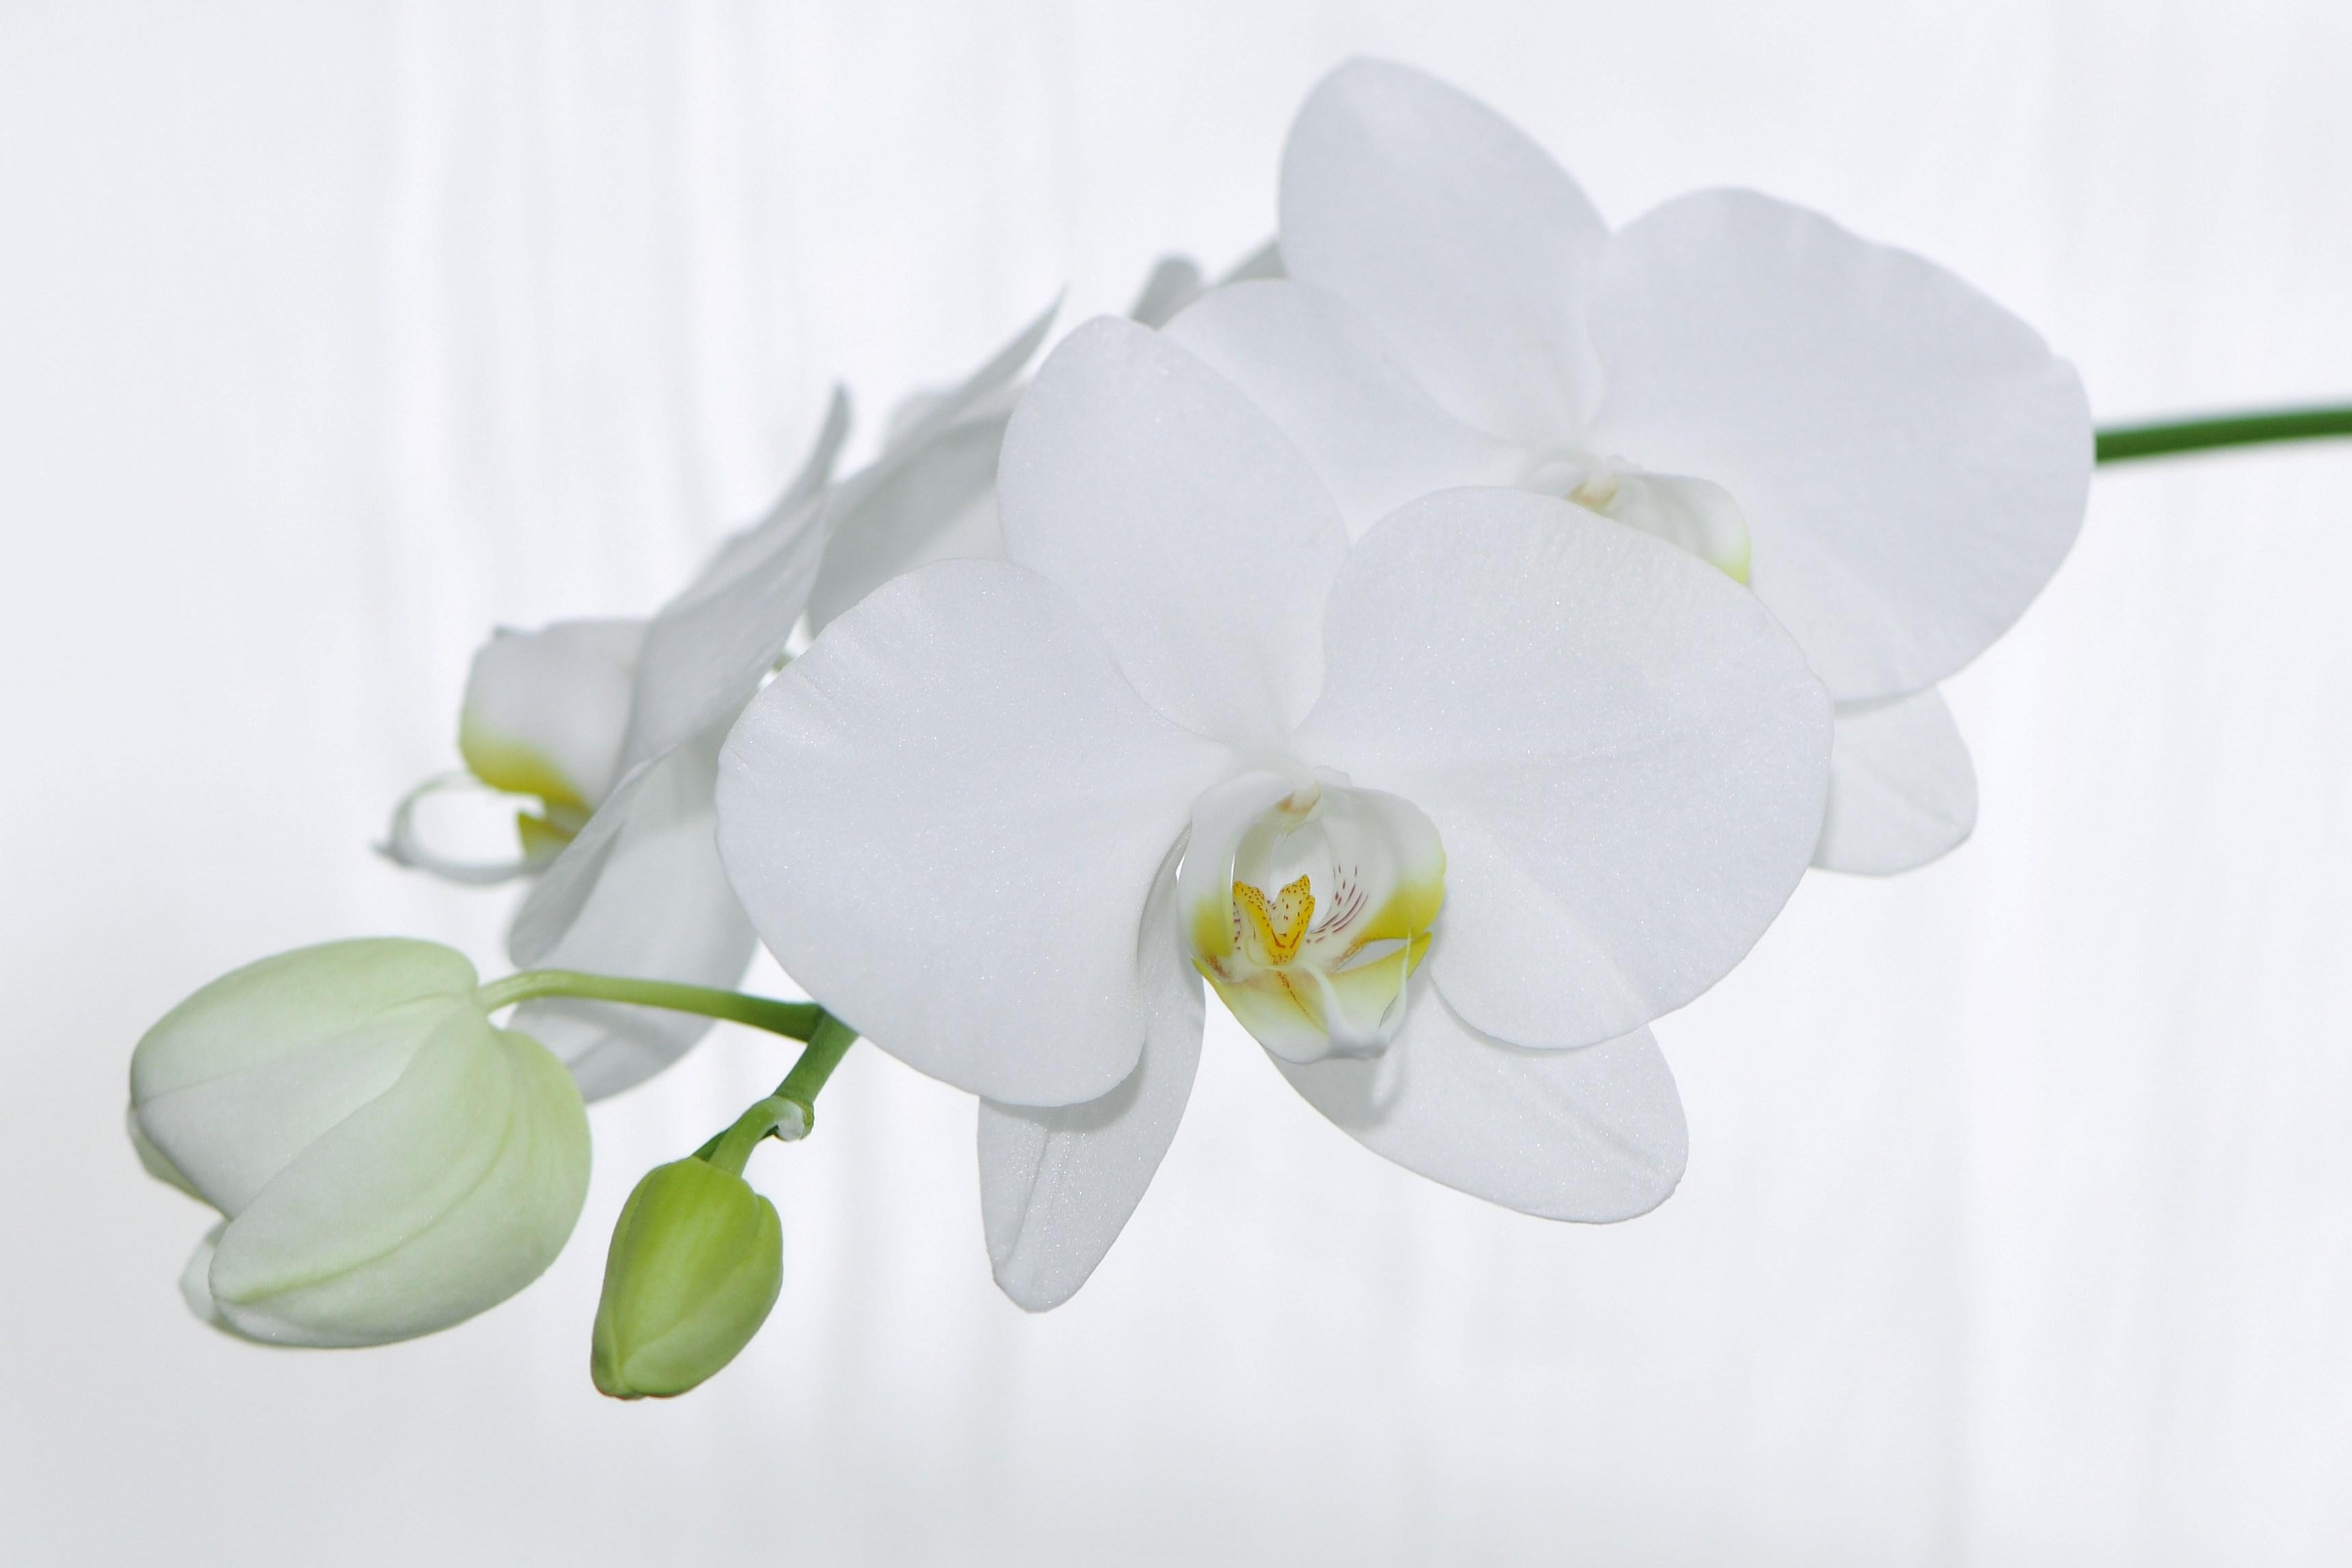 file nachtfalter orchidee phalaenopsis 10 jpg wikimedia. Black Bedroom Furniture Sets. Home Design Ideas